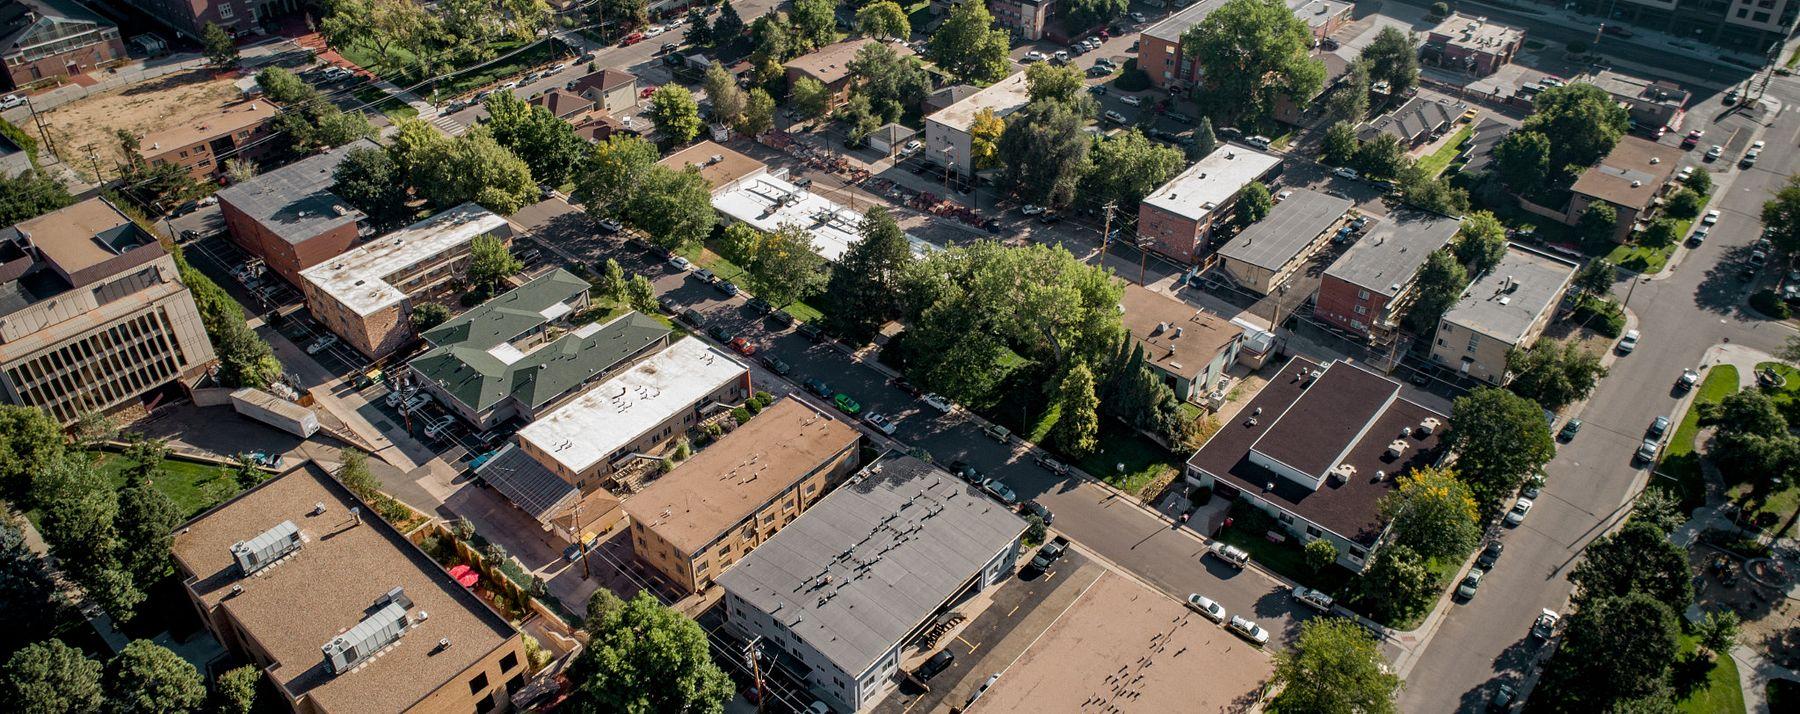 Overhead shot of campus